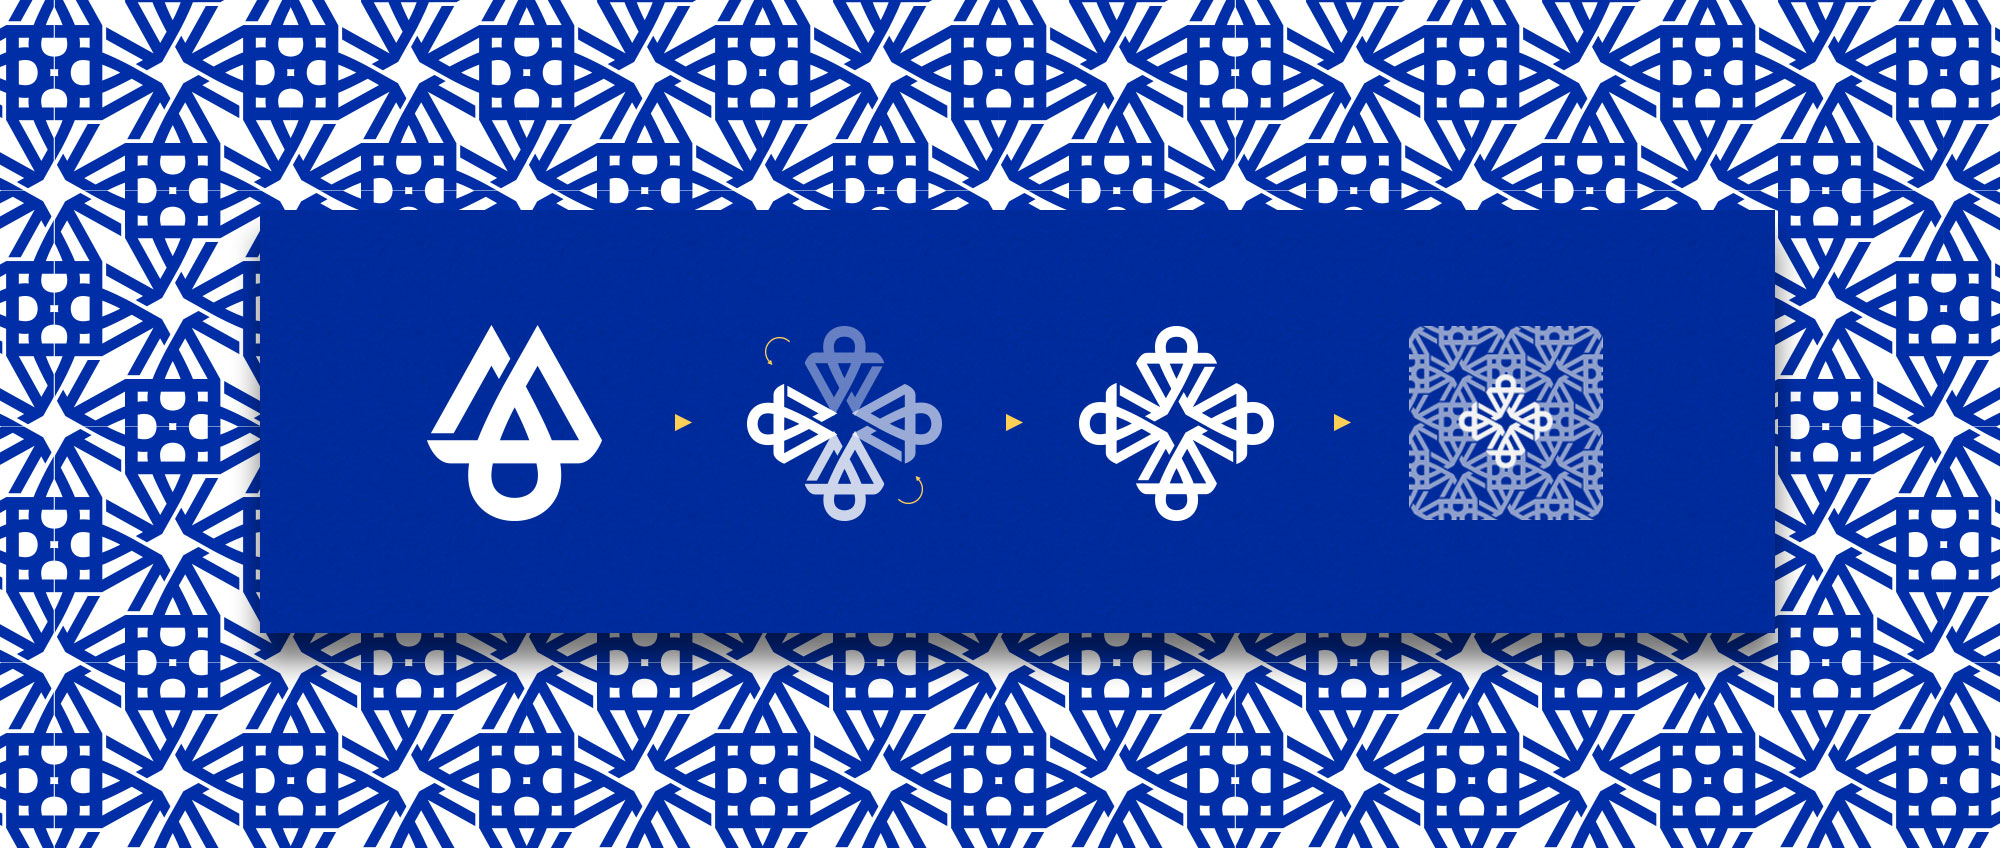 hespress-pattern-blue-mouhtadi-design